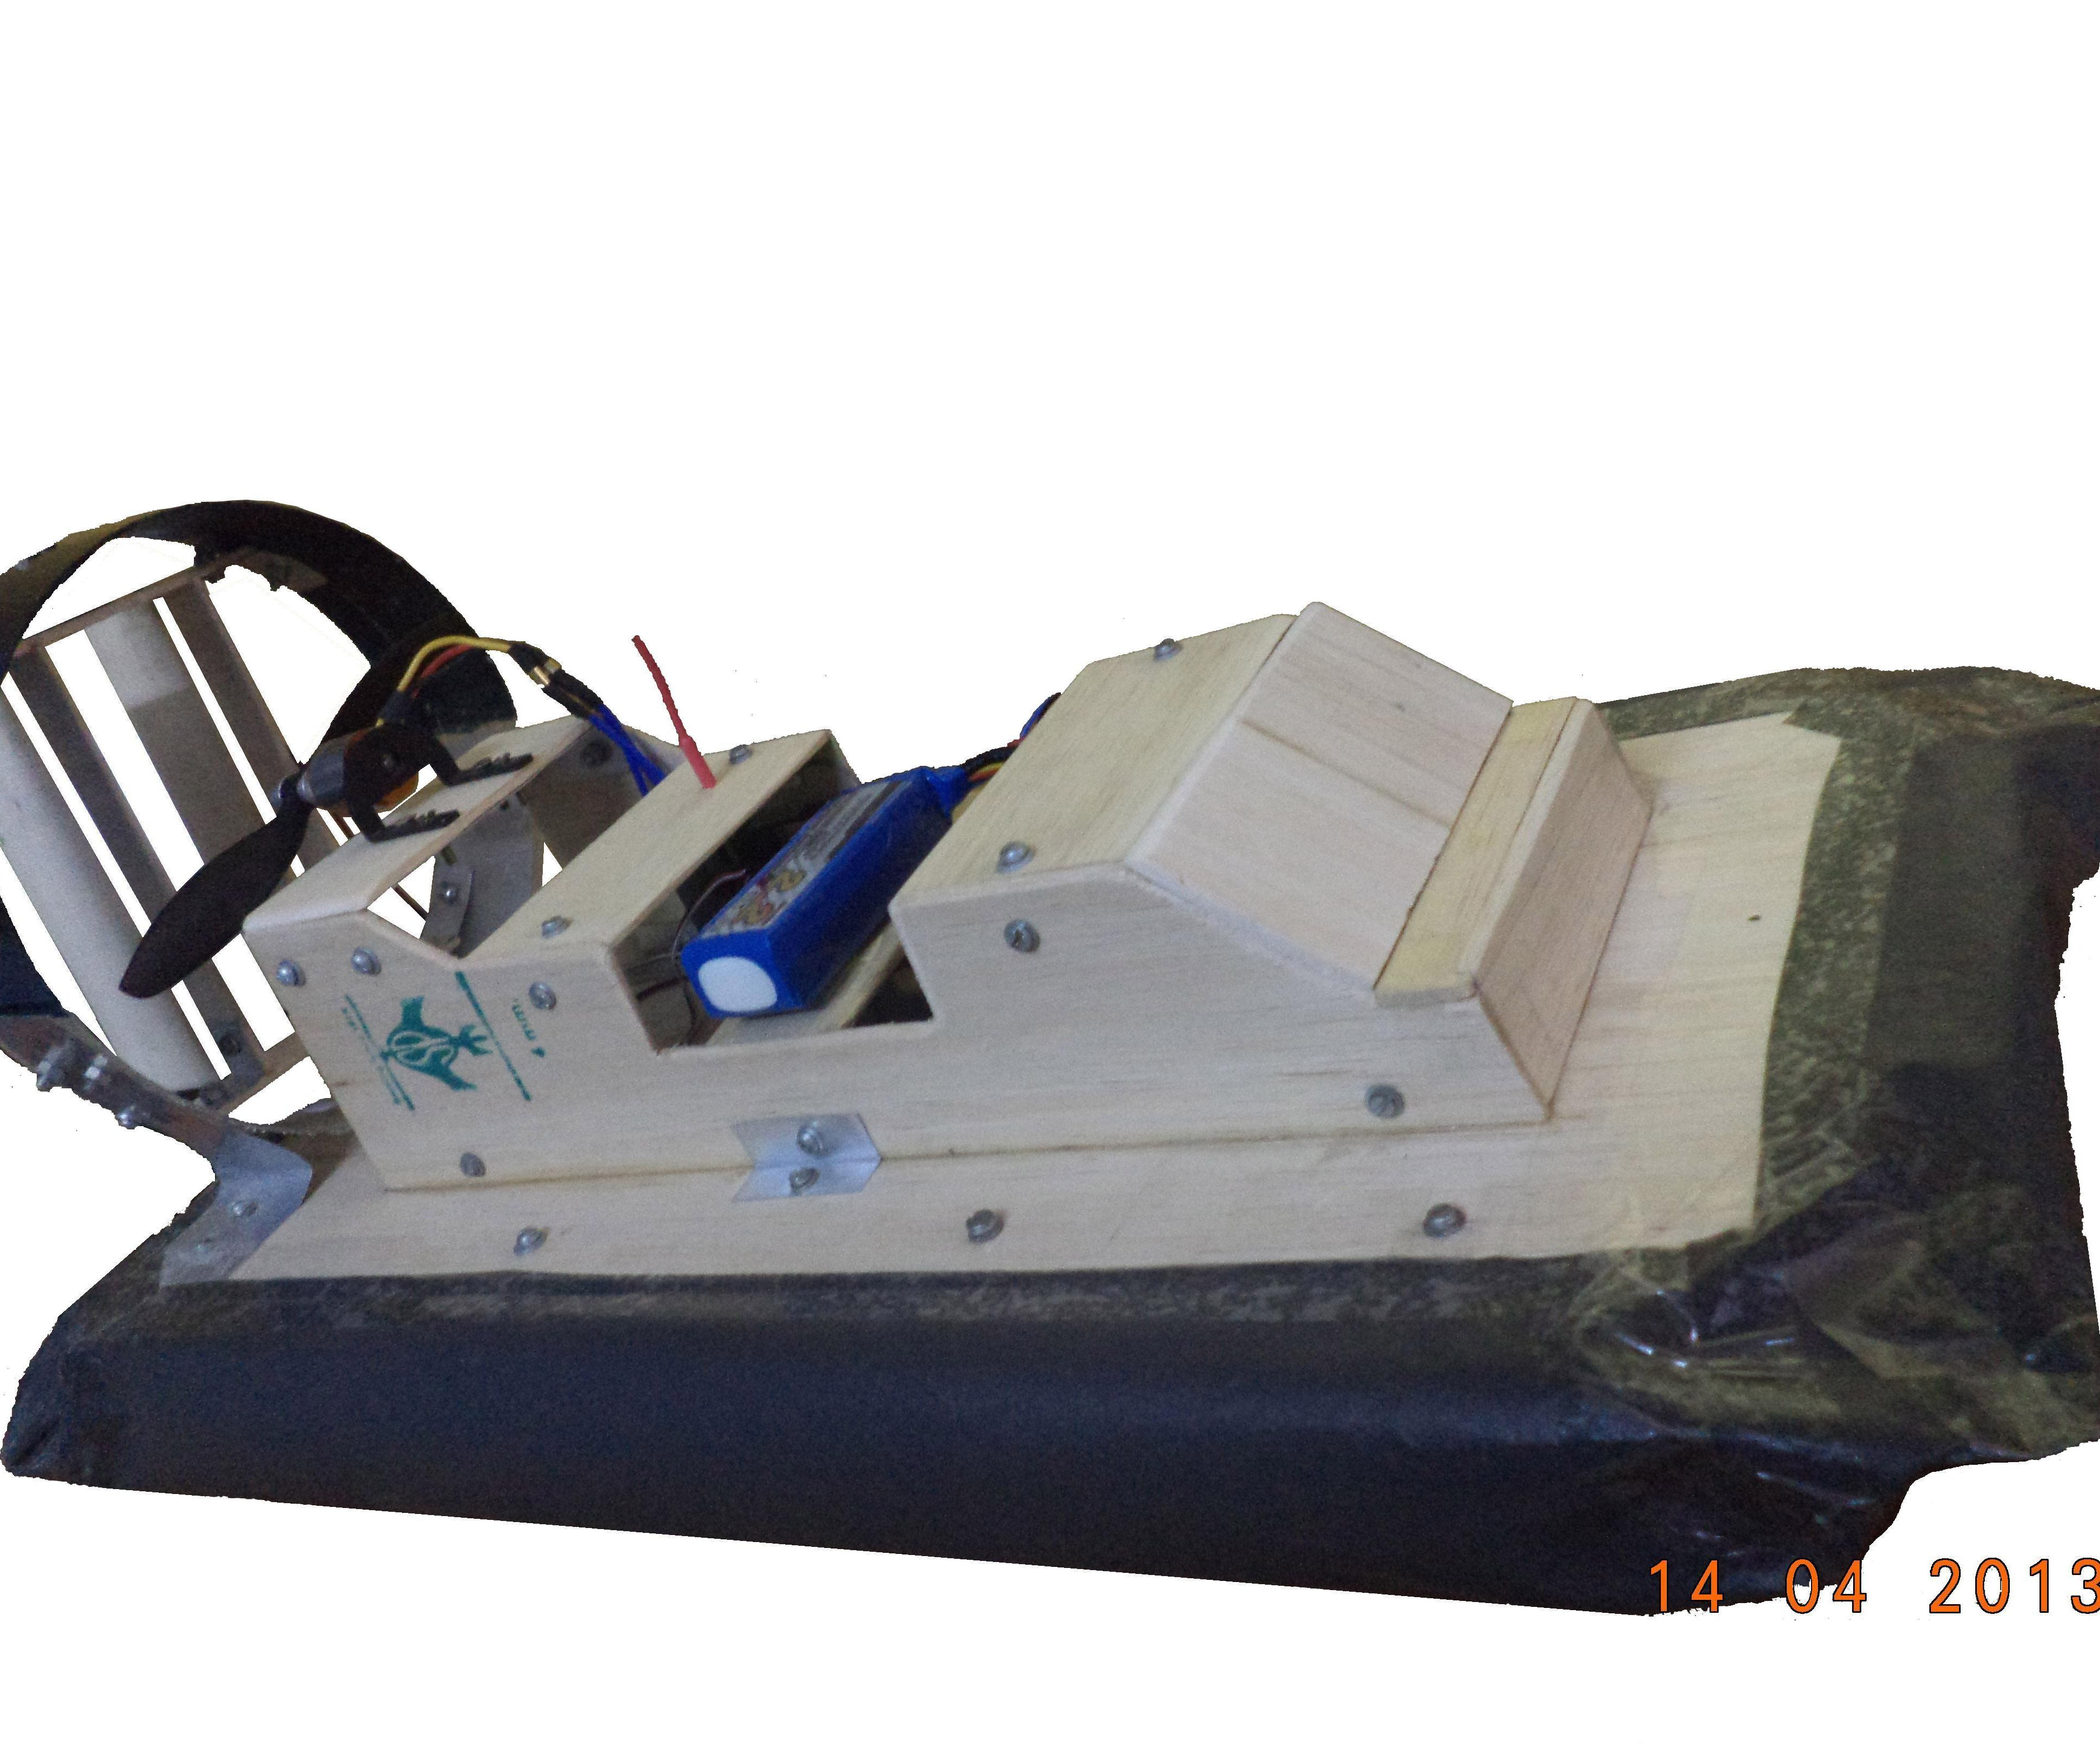 Powerful RC Hovercraft